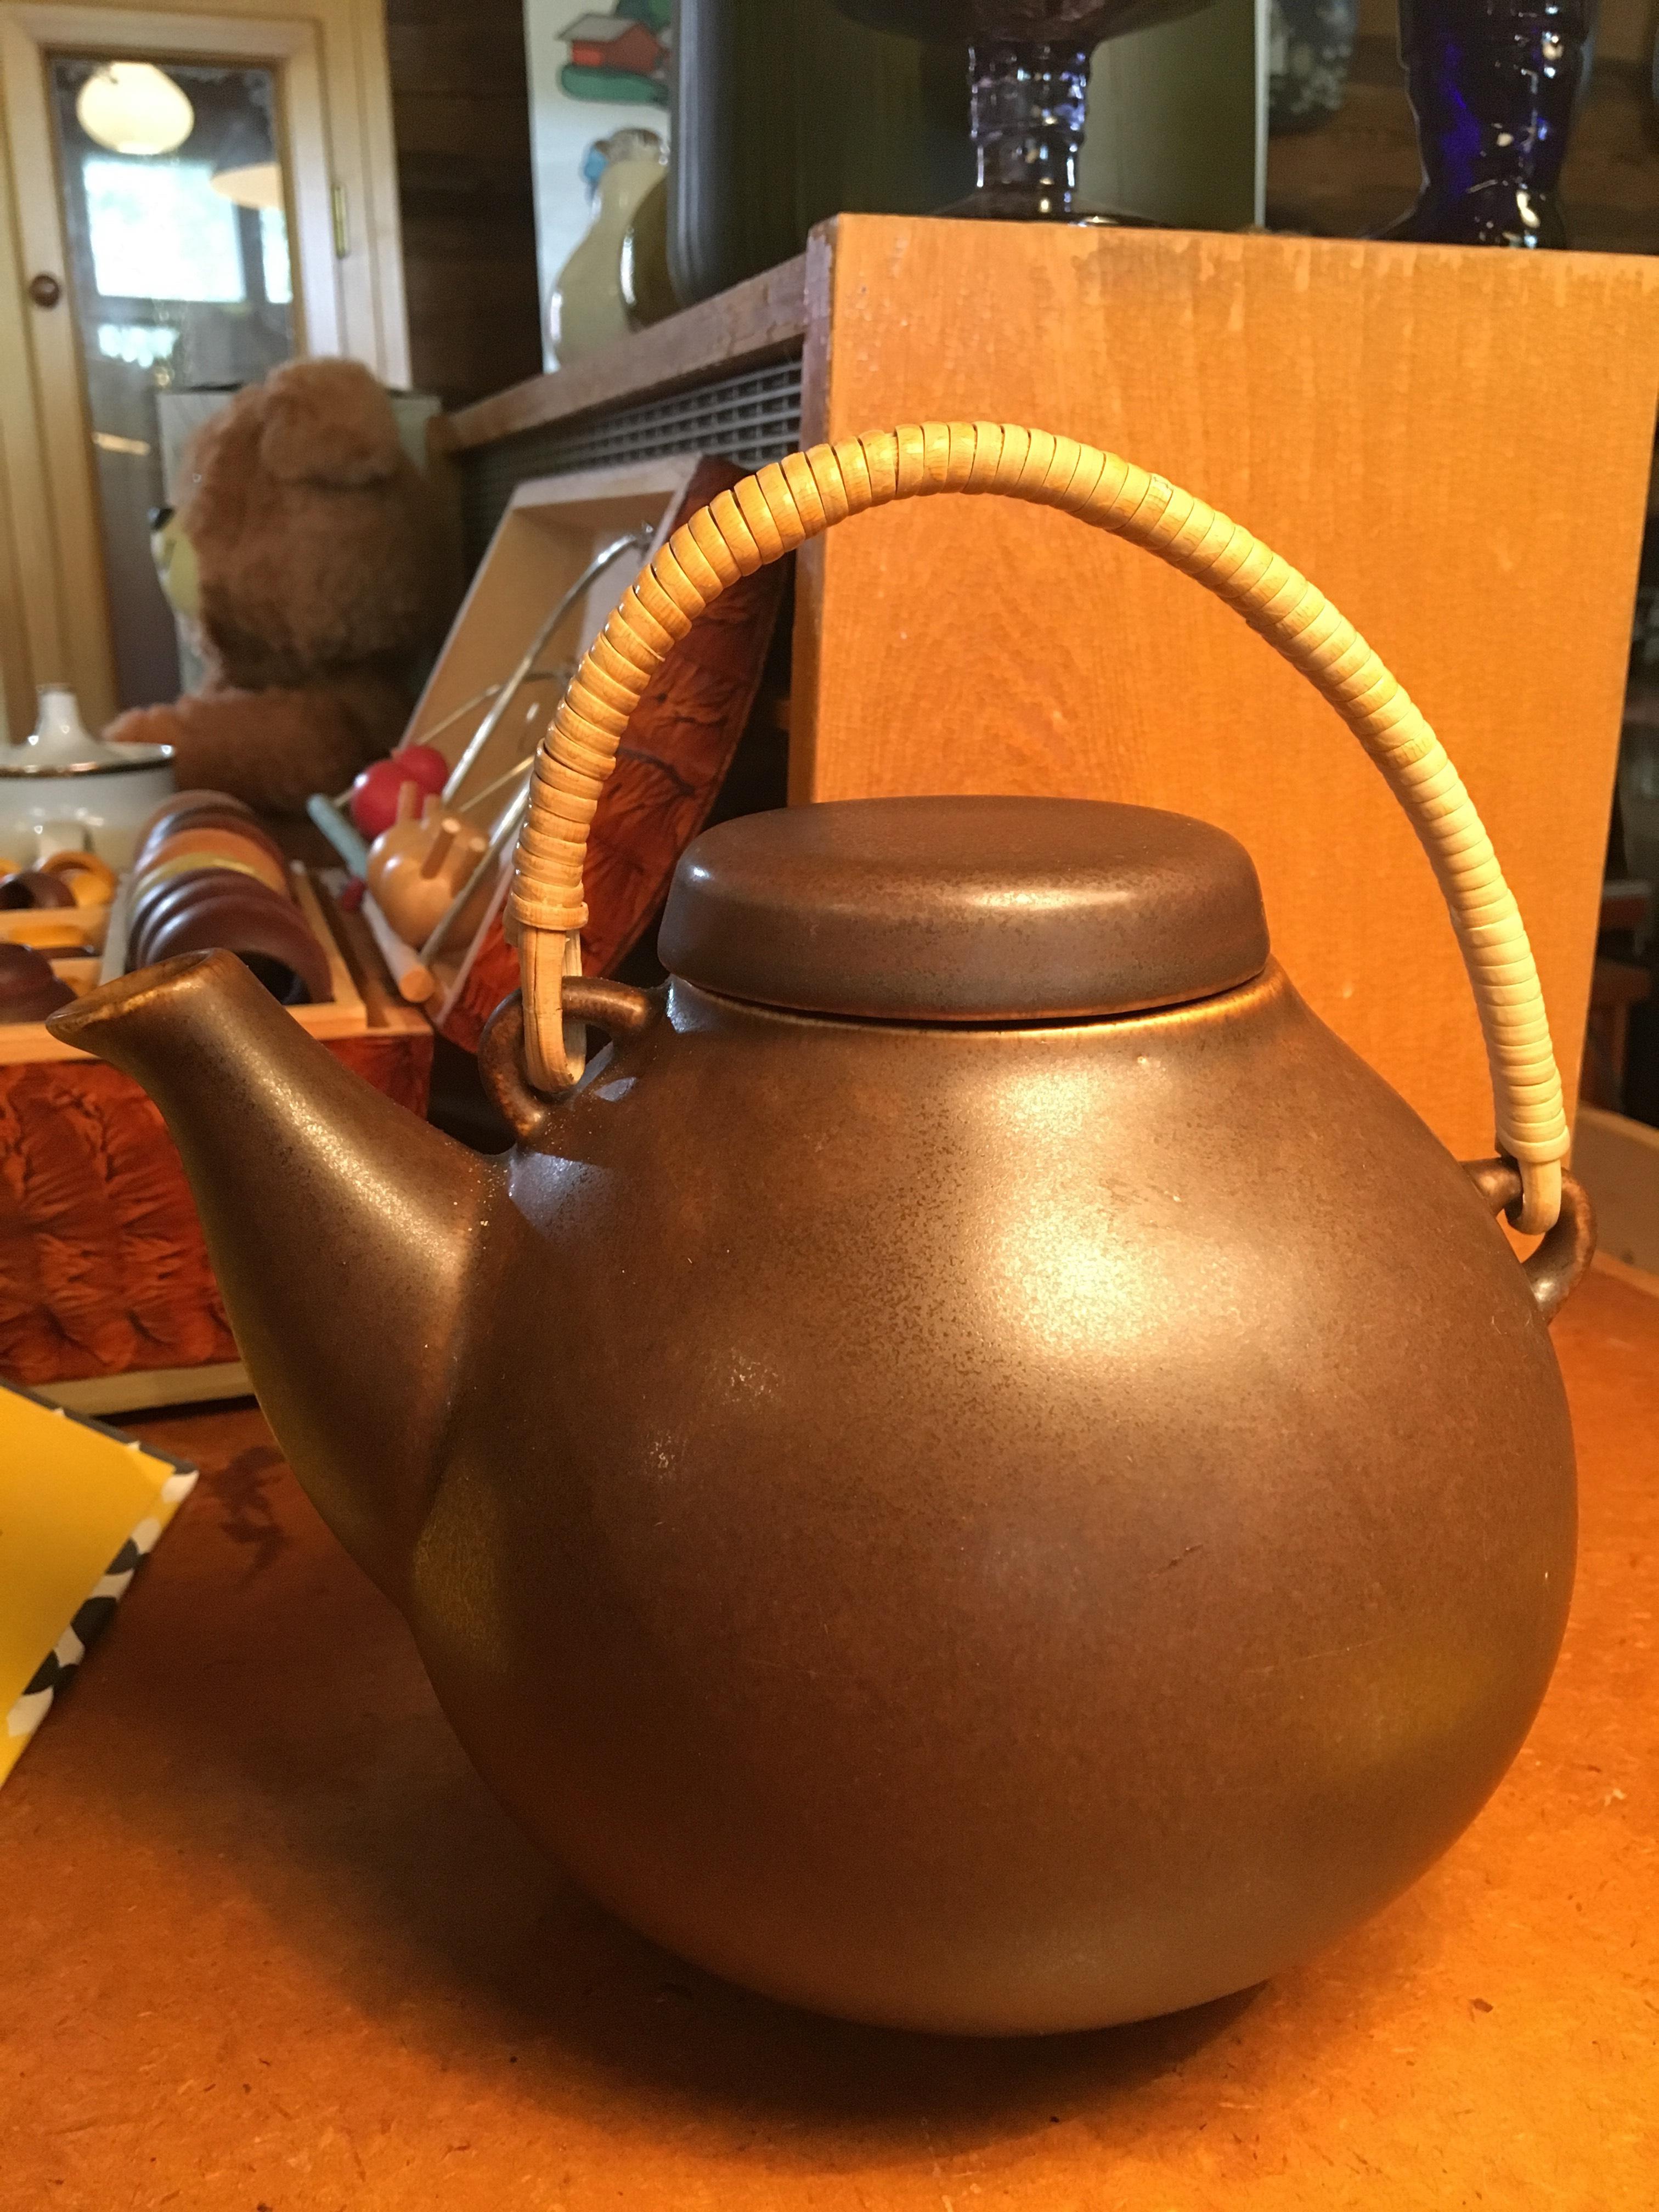 Arabia Ulla Procope teekannu suurempi koko